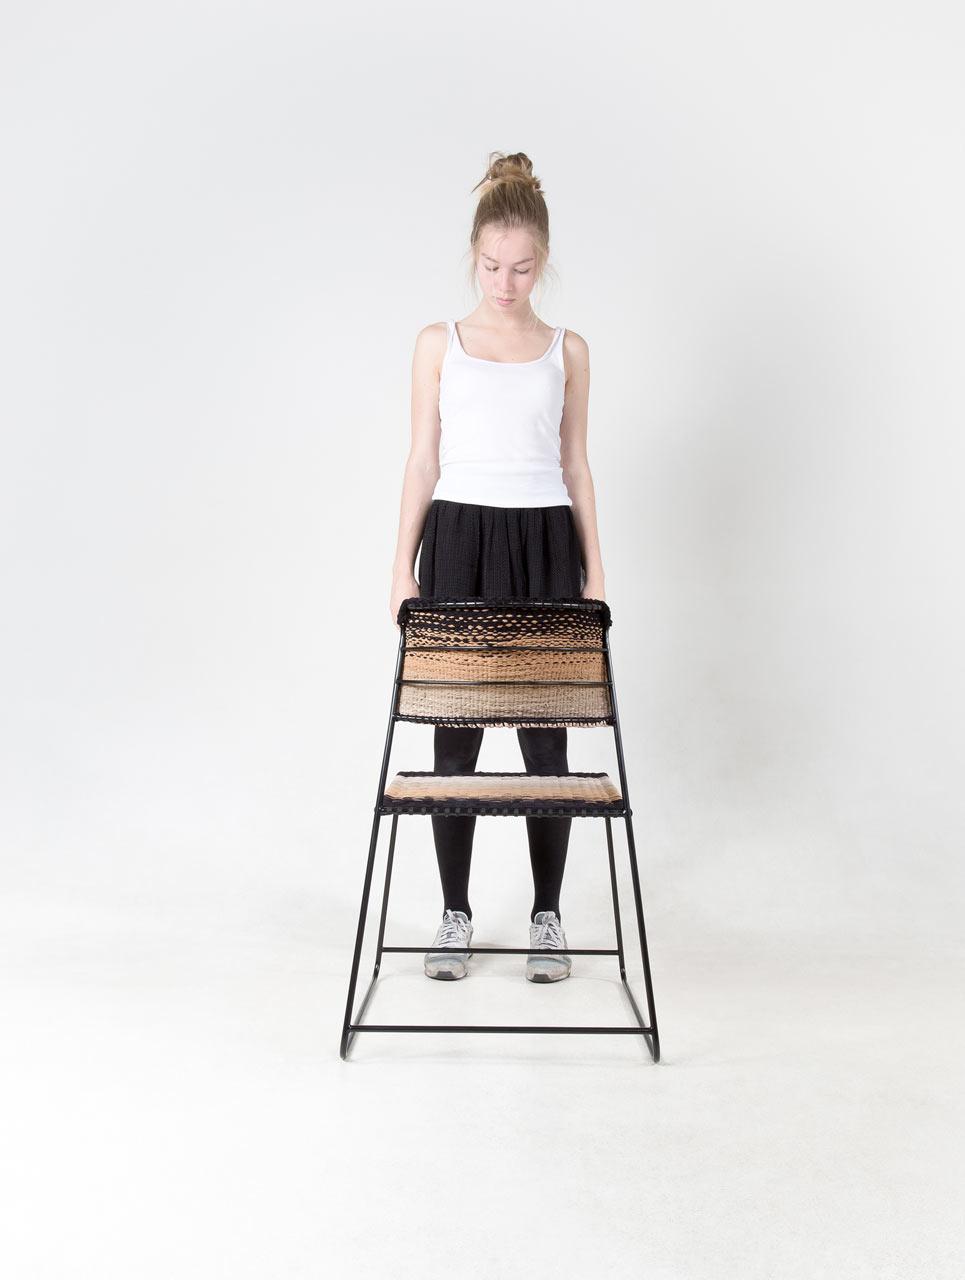 Anna-Herrmann-50-DENS-Chair-hisheji (5)